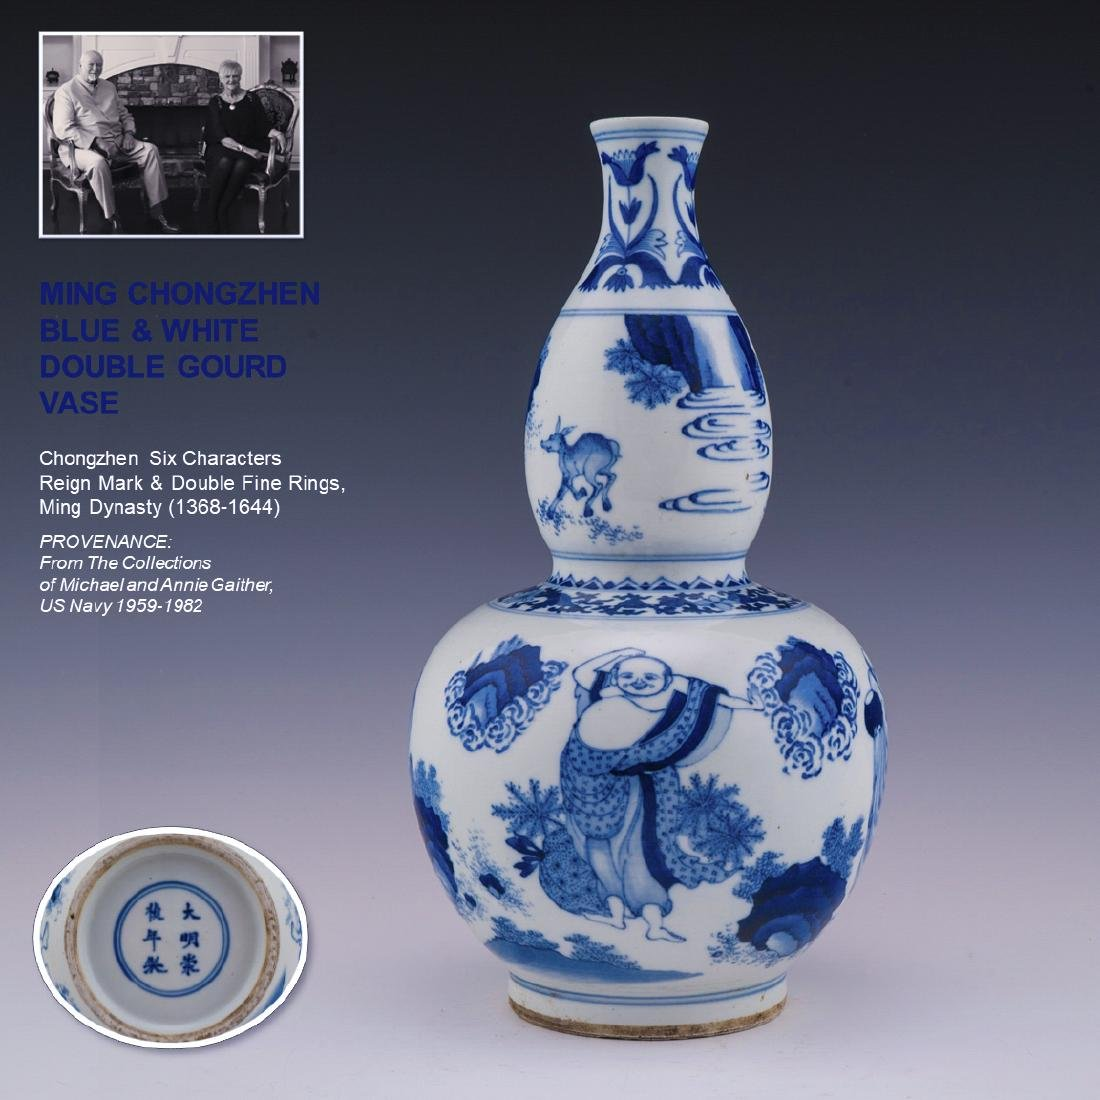 CHONGZHEN BLUE & WHITE DOUBLE GOURD VASE